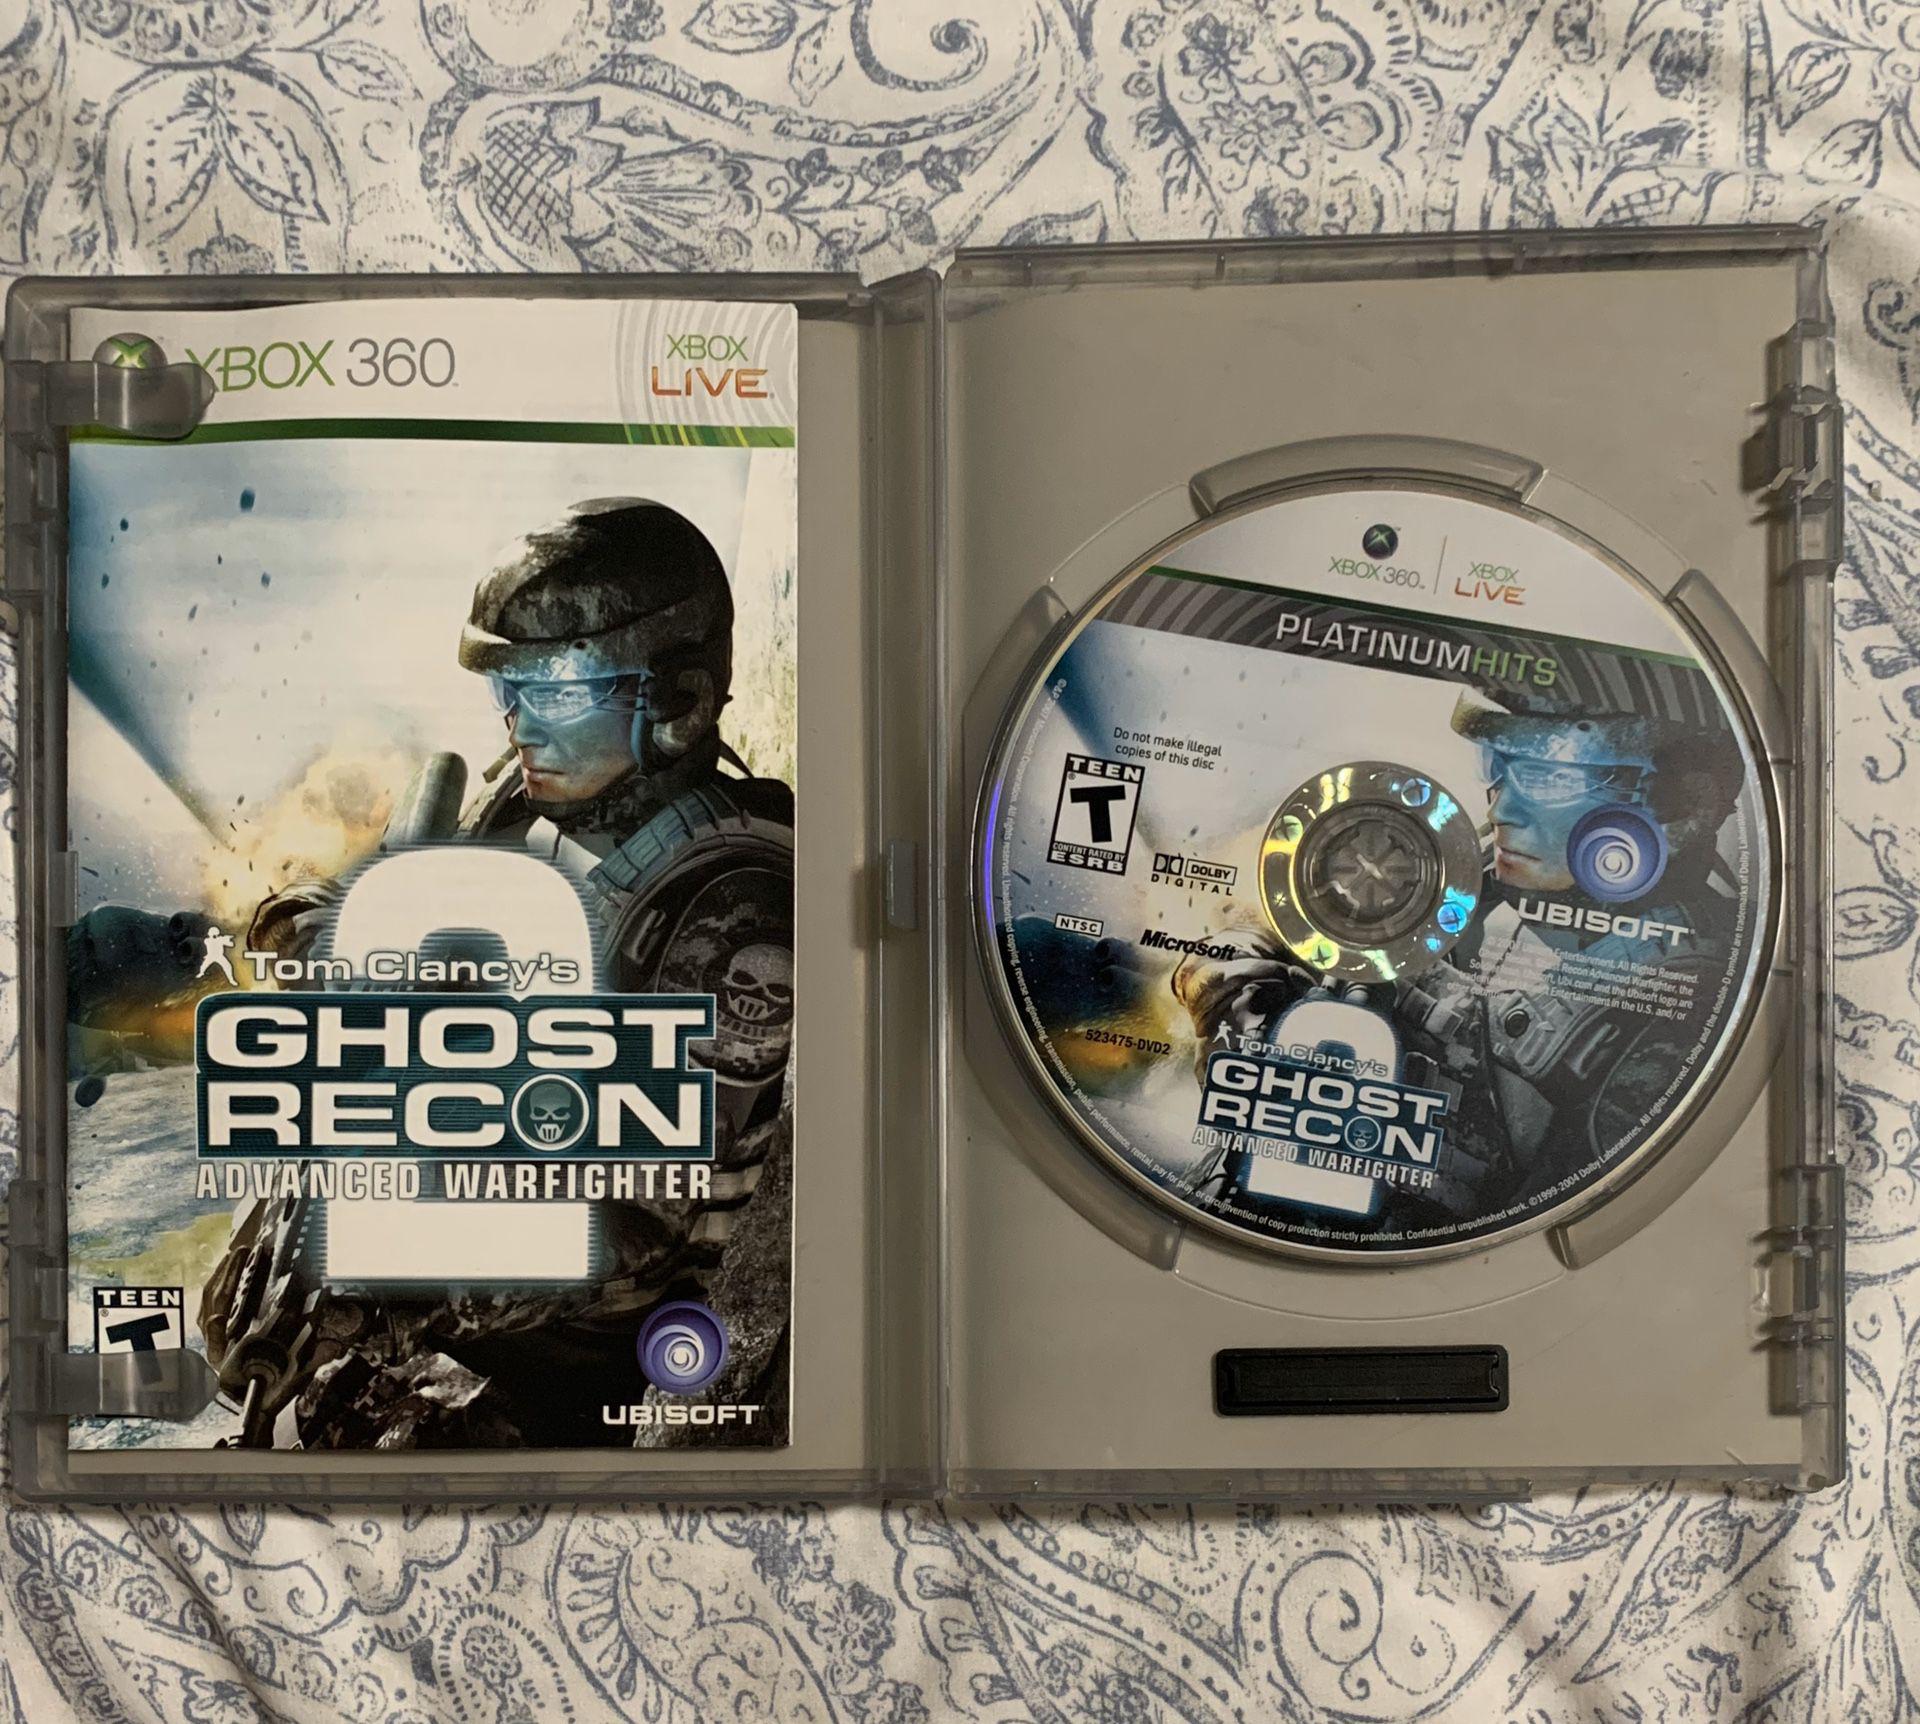 Tom Clancy's Ghost Recon Advanced Warfighter 2 (Xbox 360)